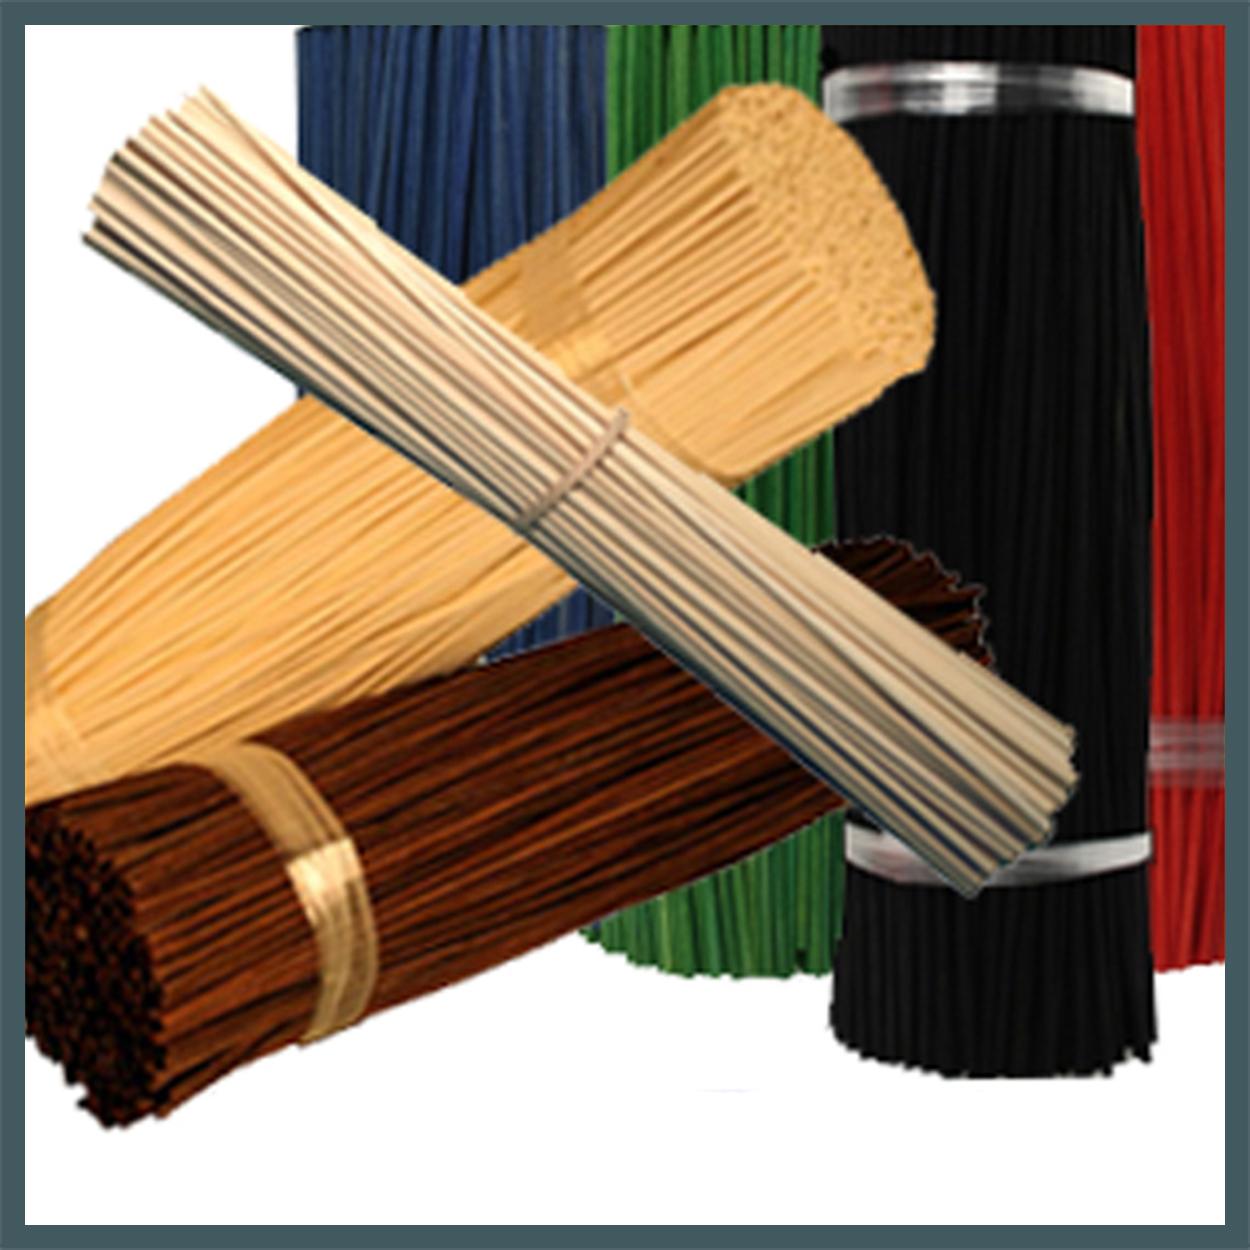 diffuser reeds sticks